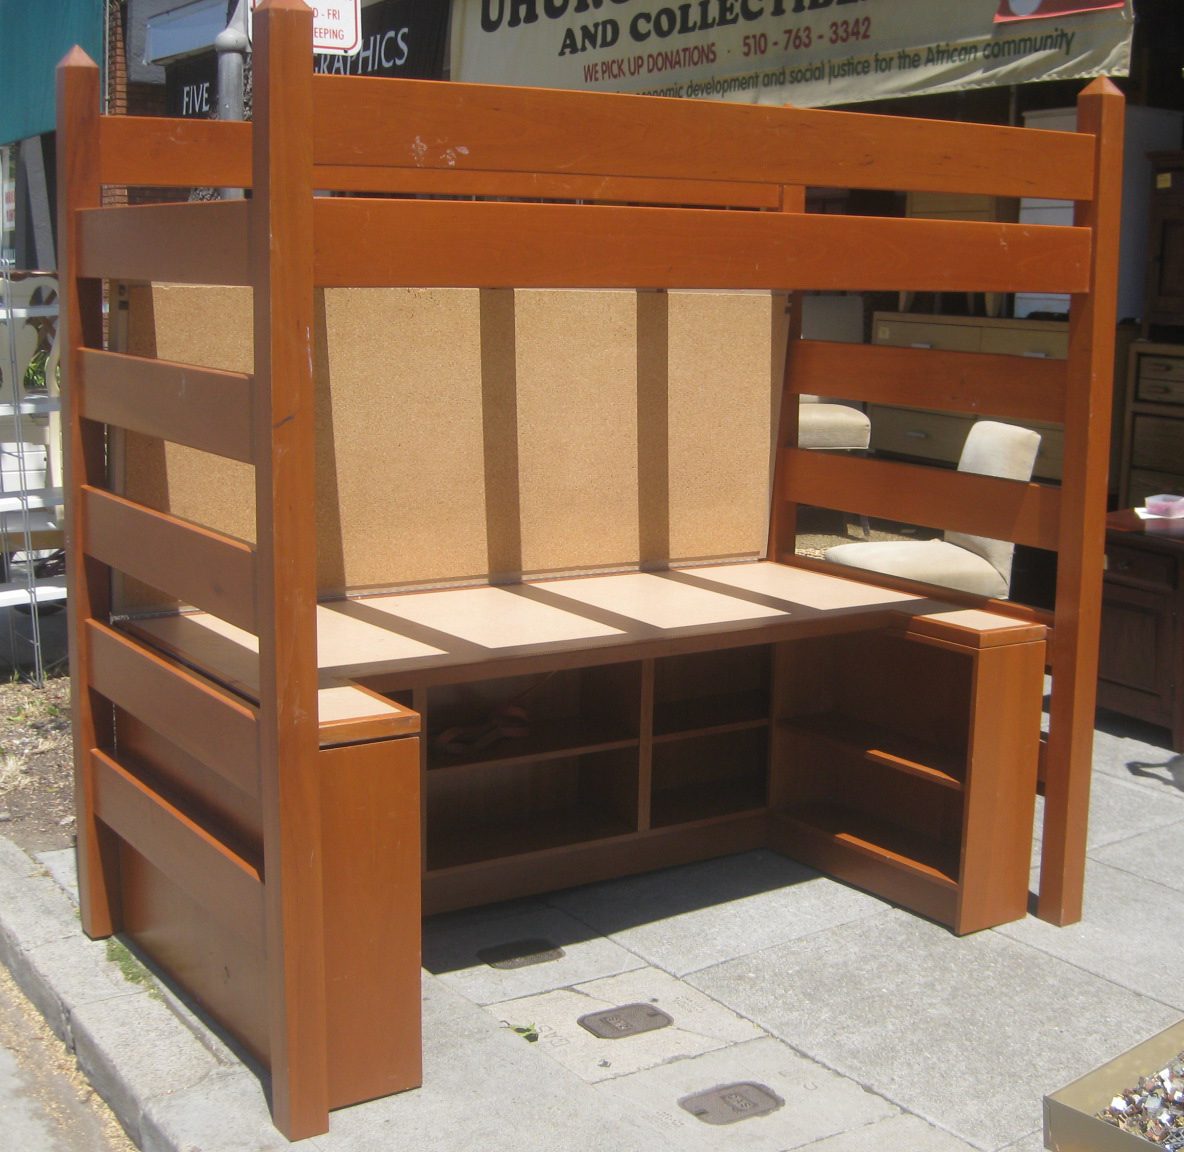 Uhuru Furniture Amp Collectibles Sold Loft Desk Bunk With